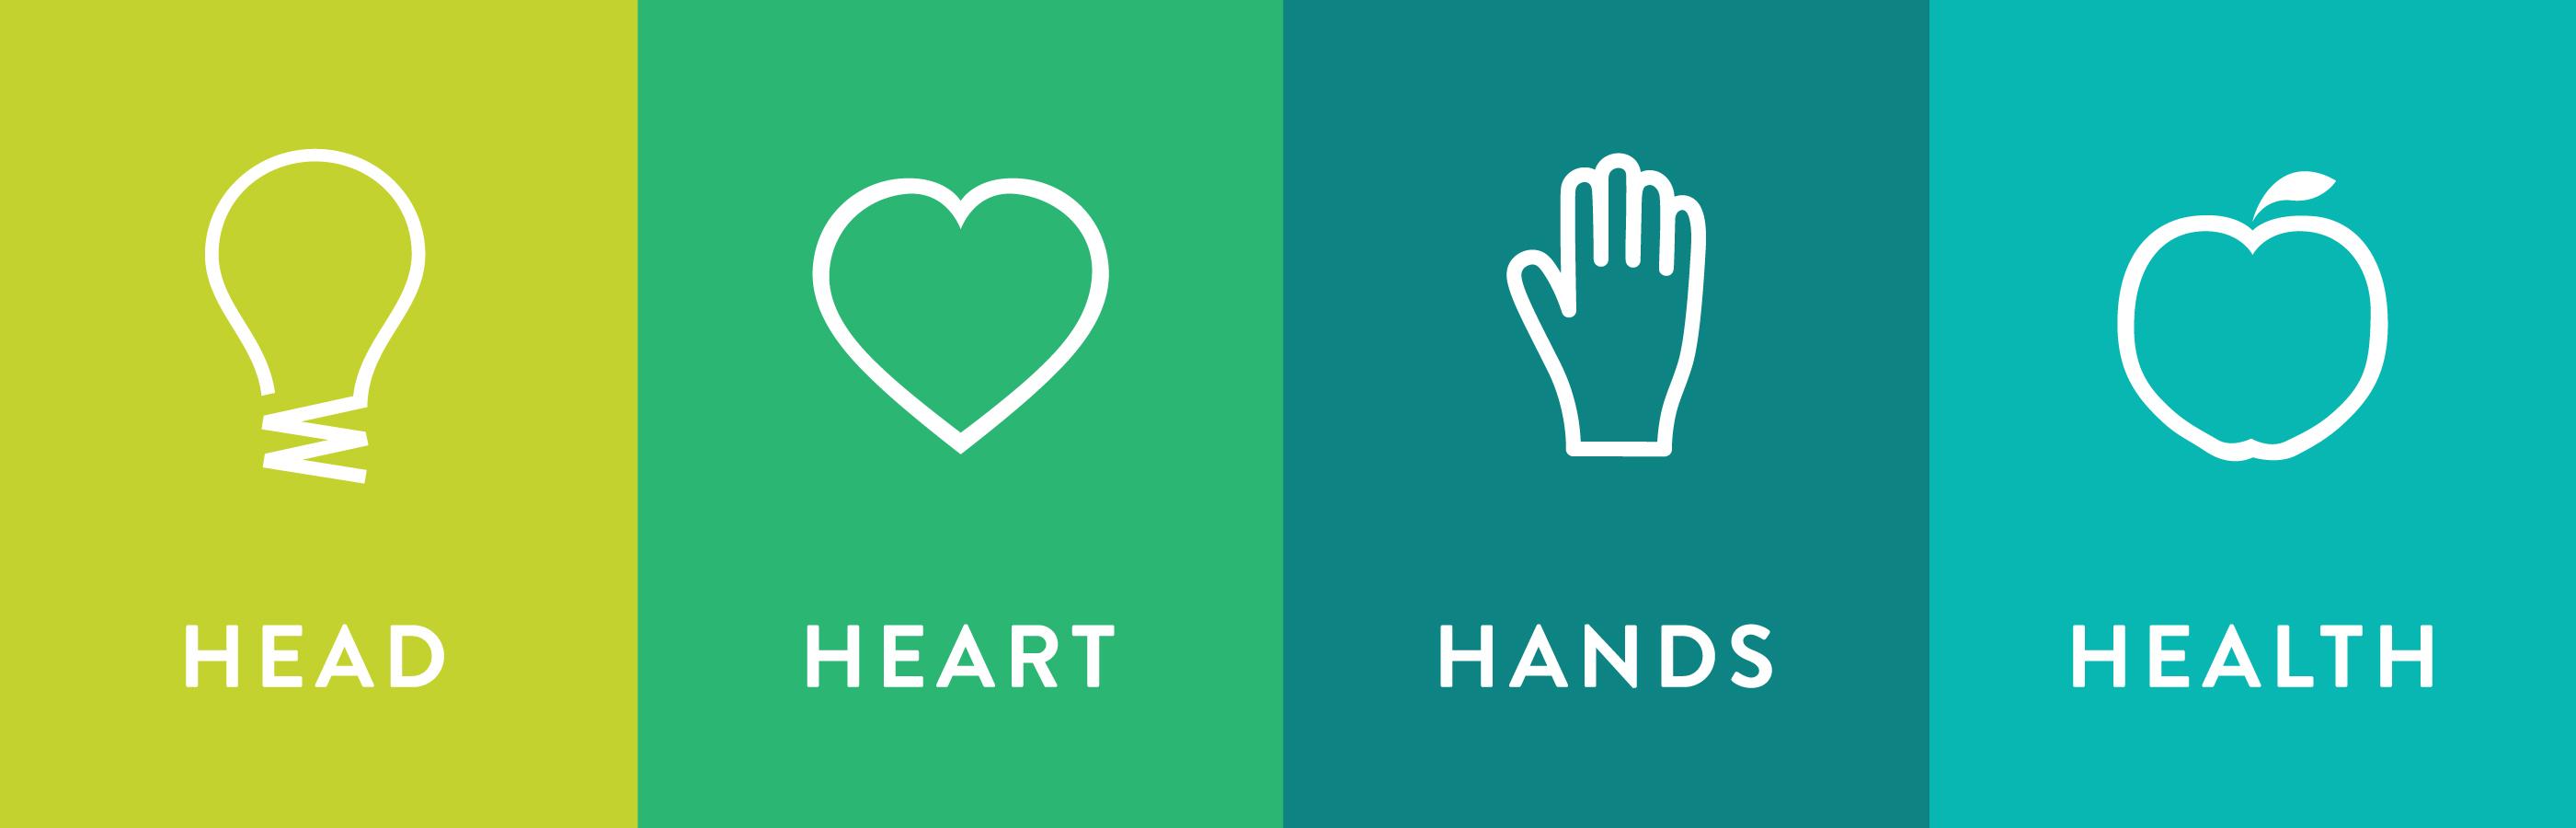 Head, heart, hands, health logo